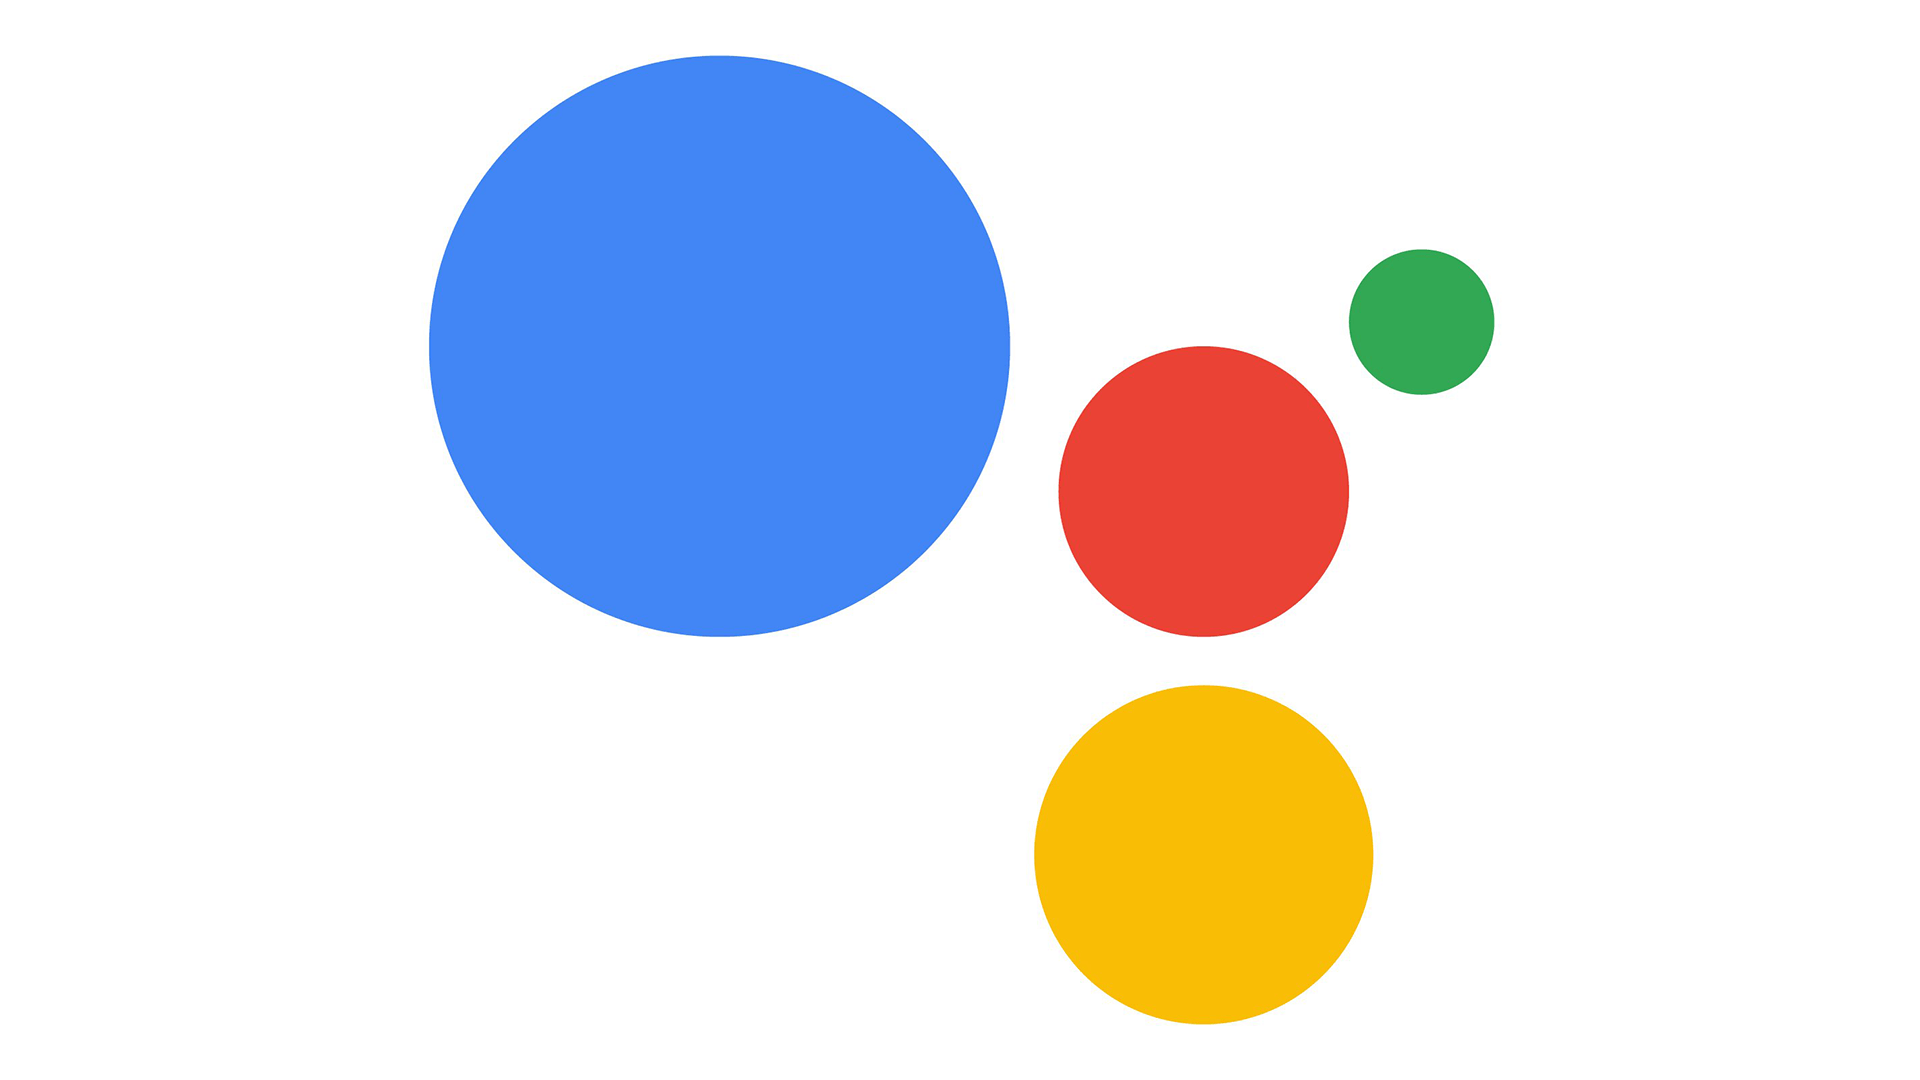 Google Wallpapers Background   Google Assistant Wallpaper 1920x1080